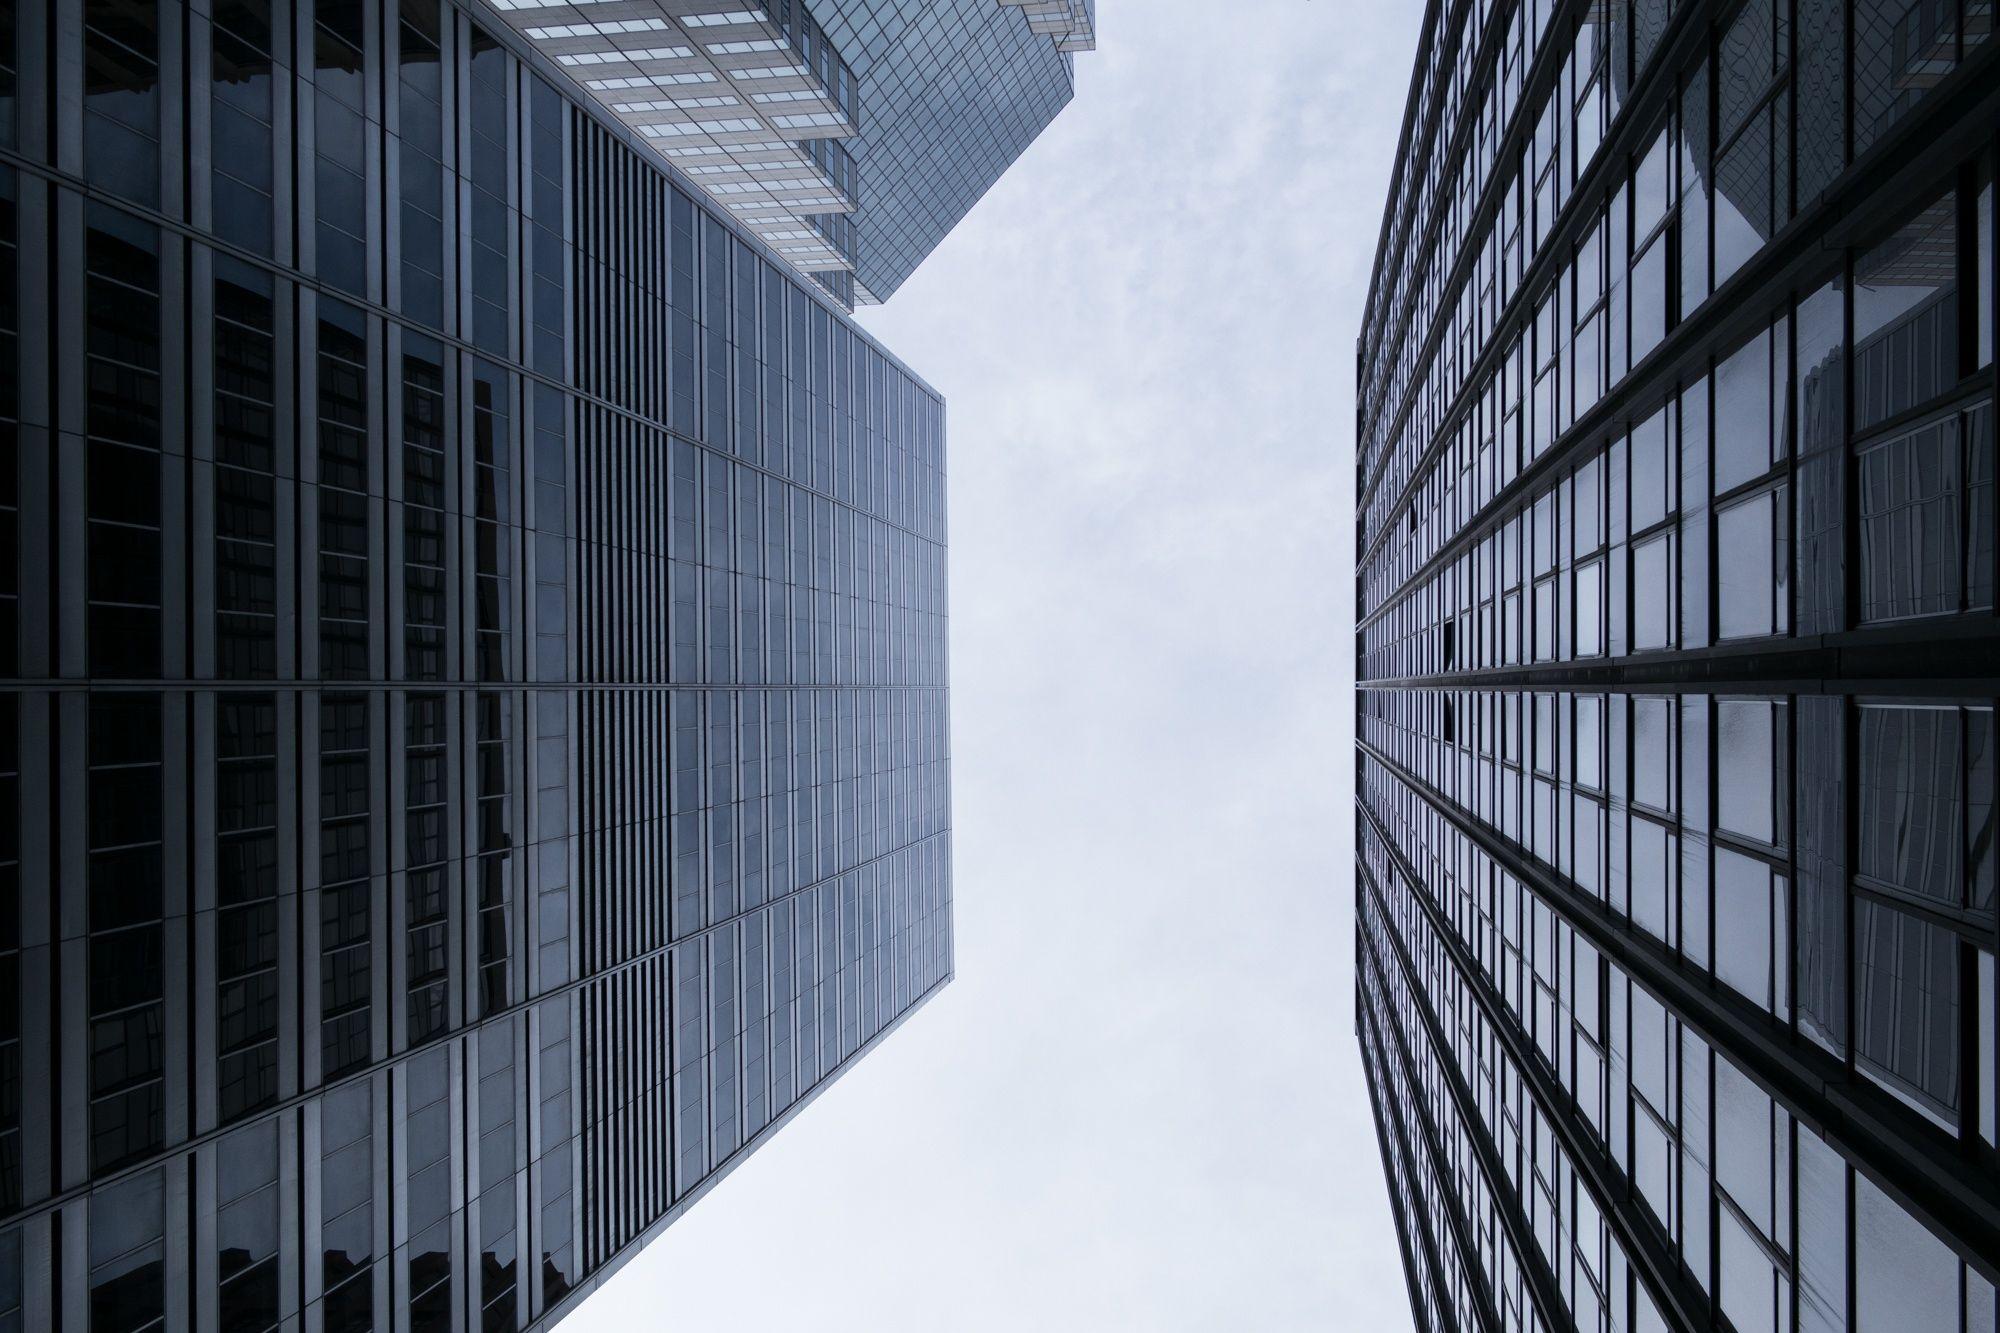 Photograph New York Skyscraper II by Manuel Caraballo on 500px